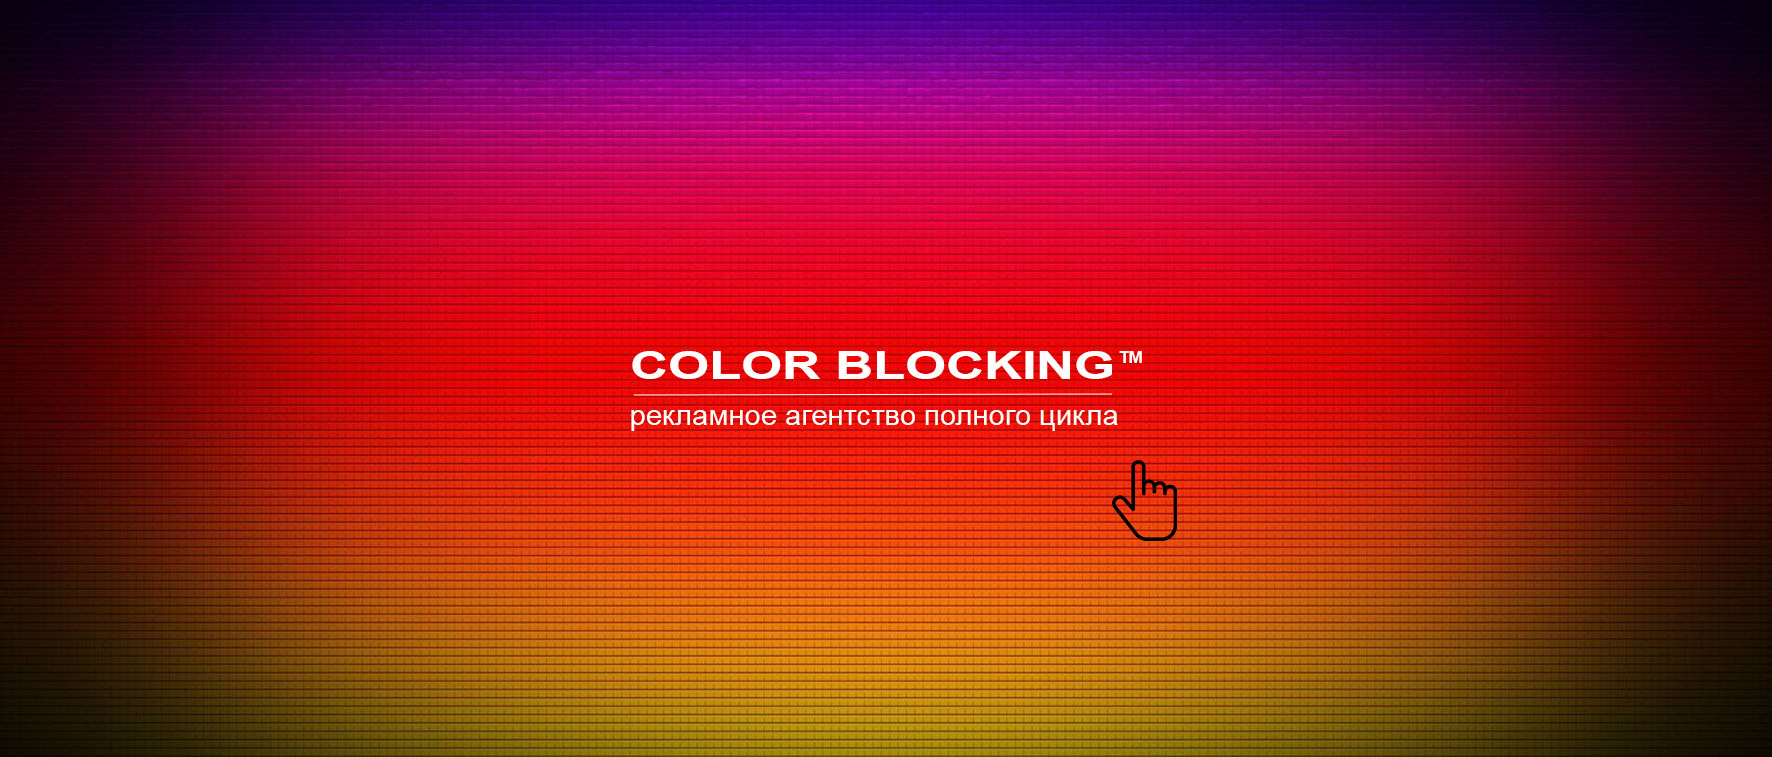 COLOR BLOCKING рекламное агентство